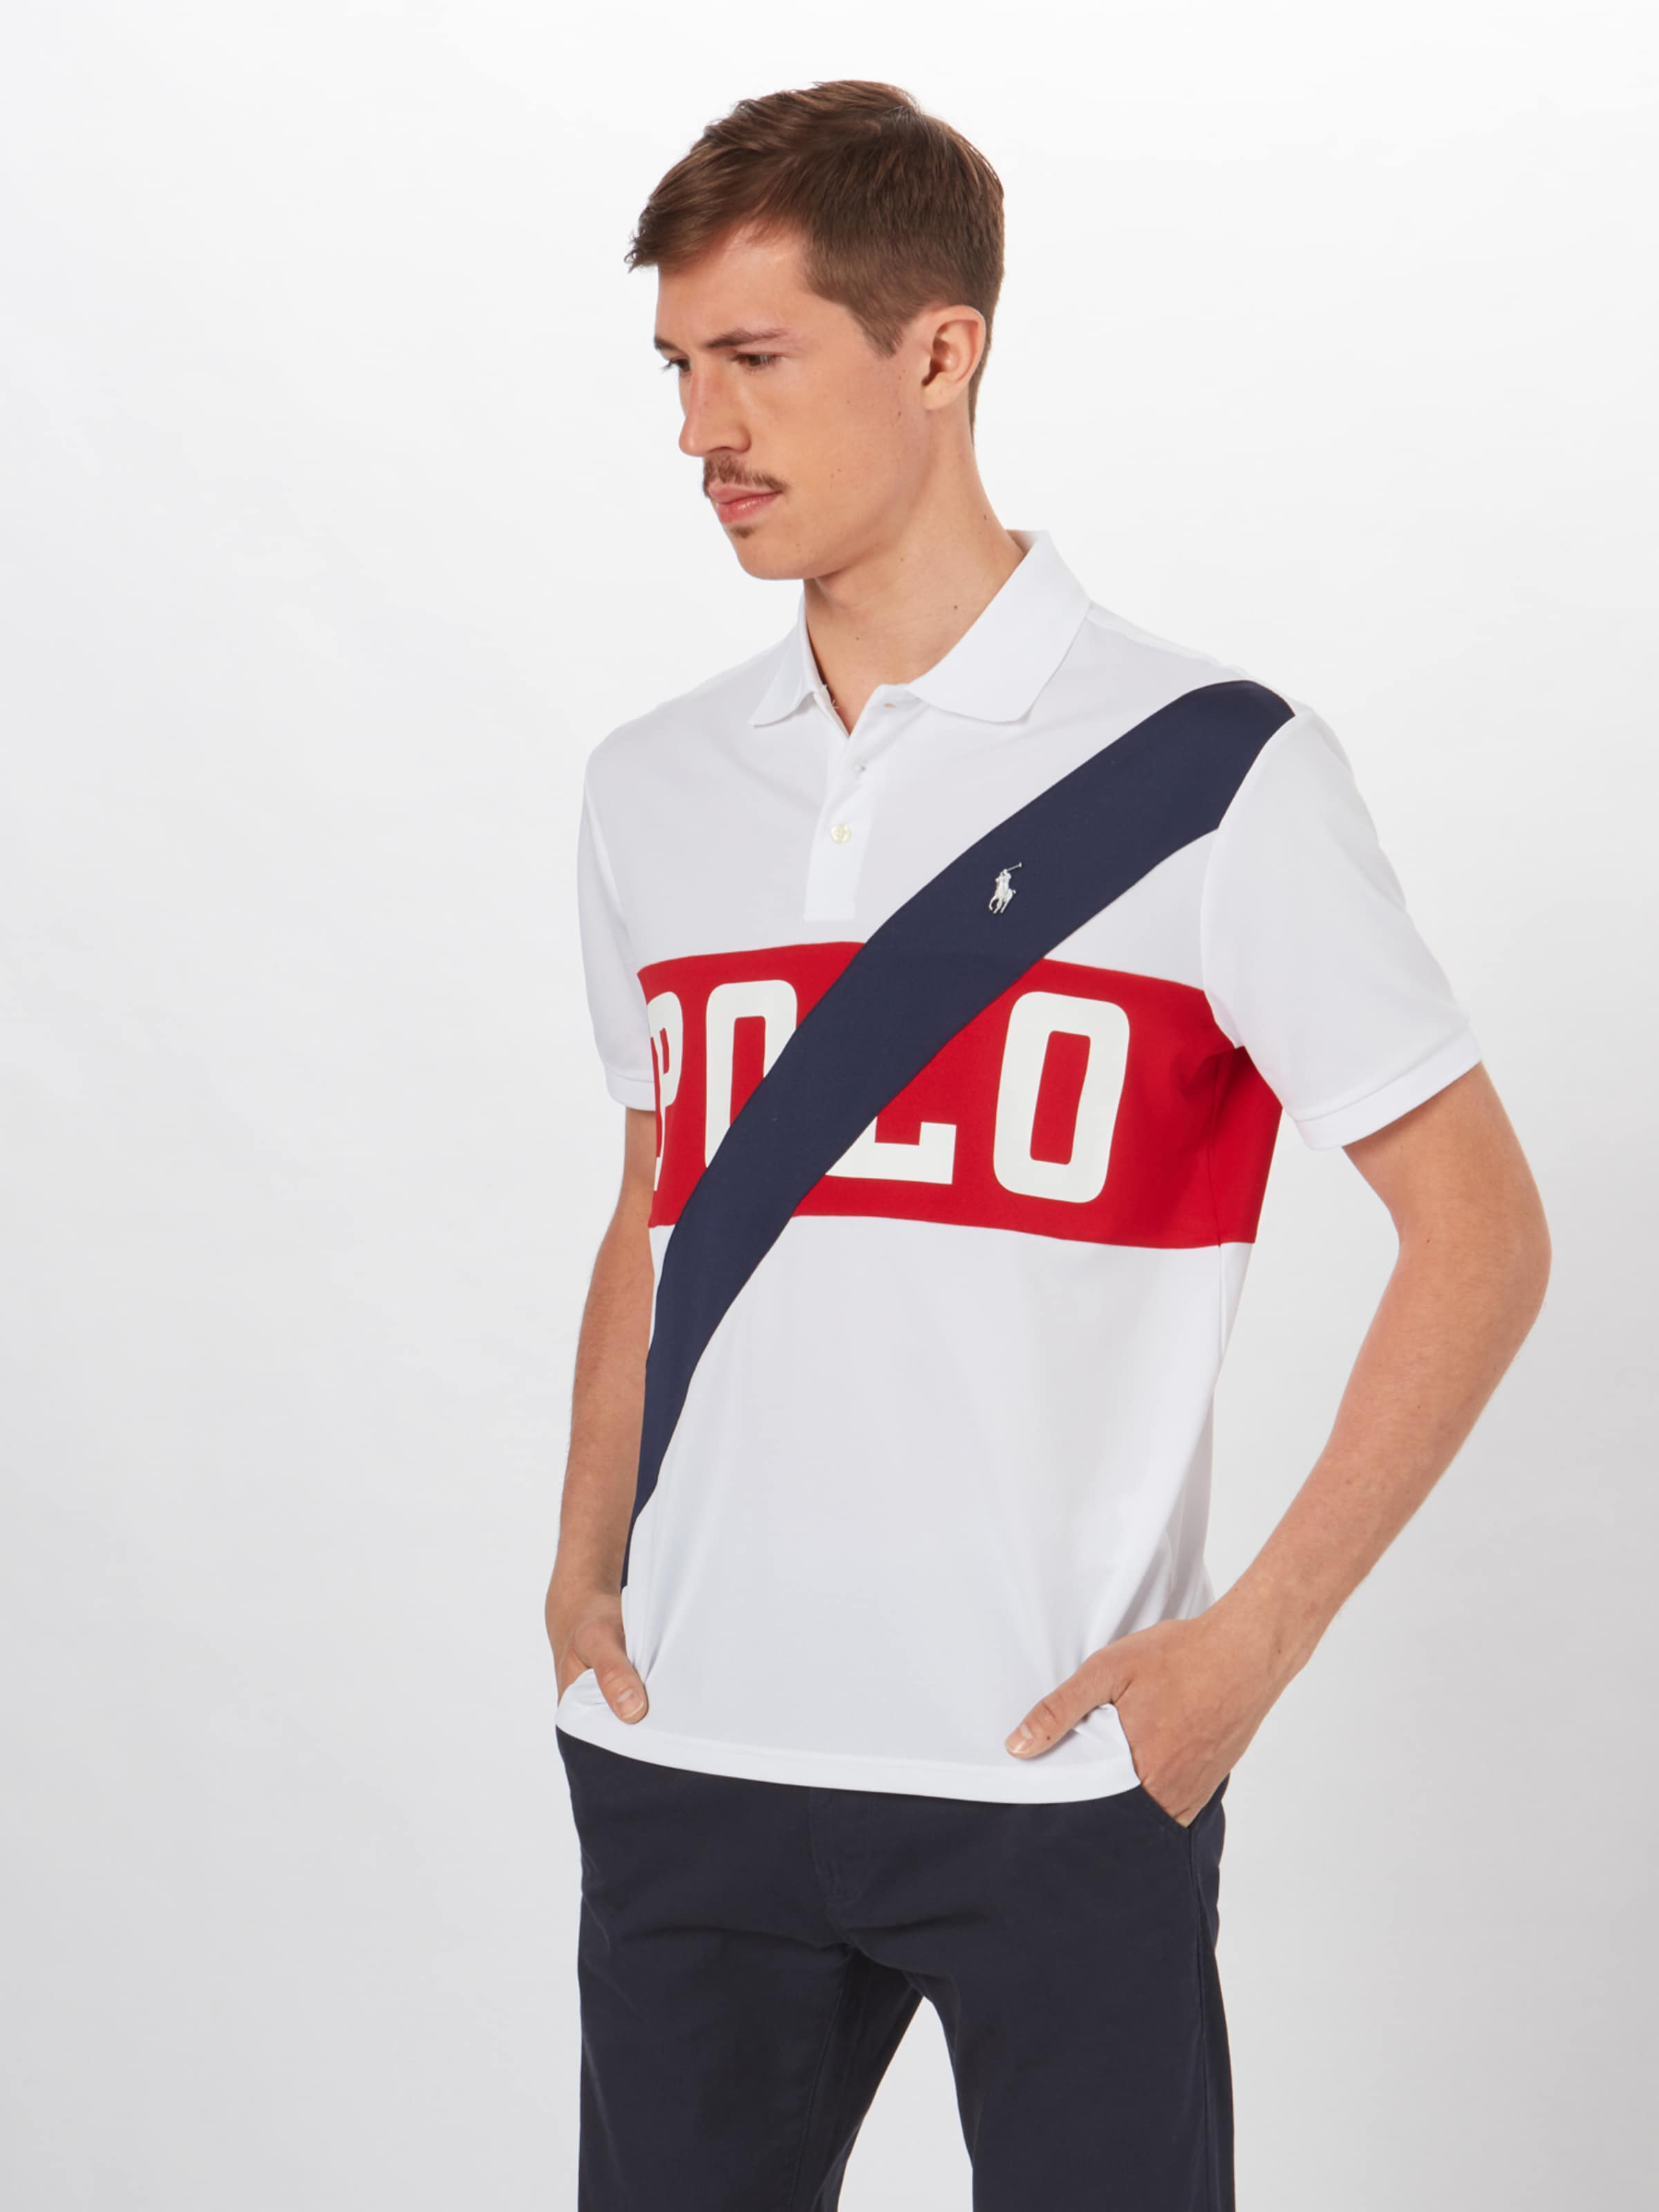 En Lauren T shirt Blanc Polo Ralph Bleu FoncéRouge m0wON8vn